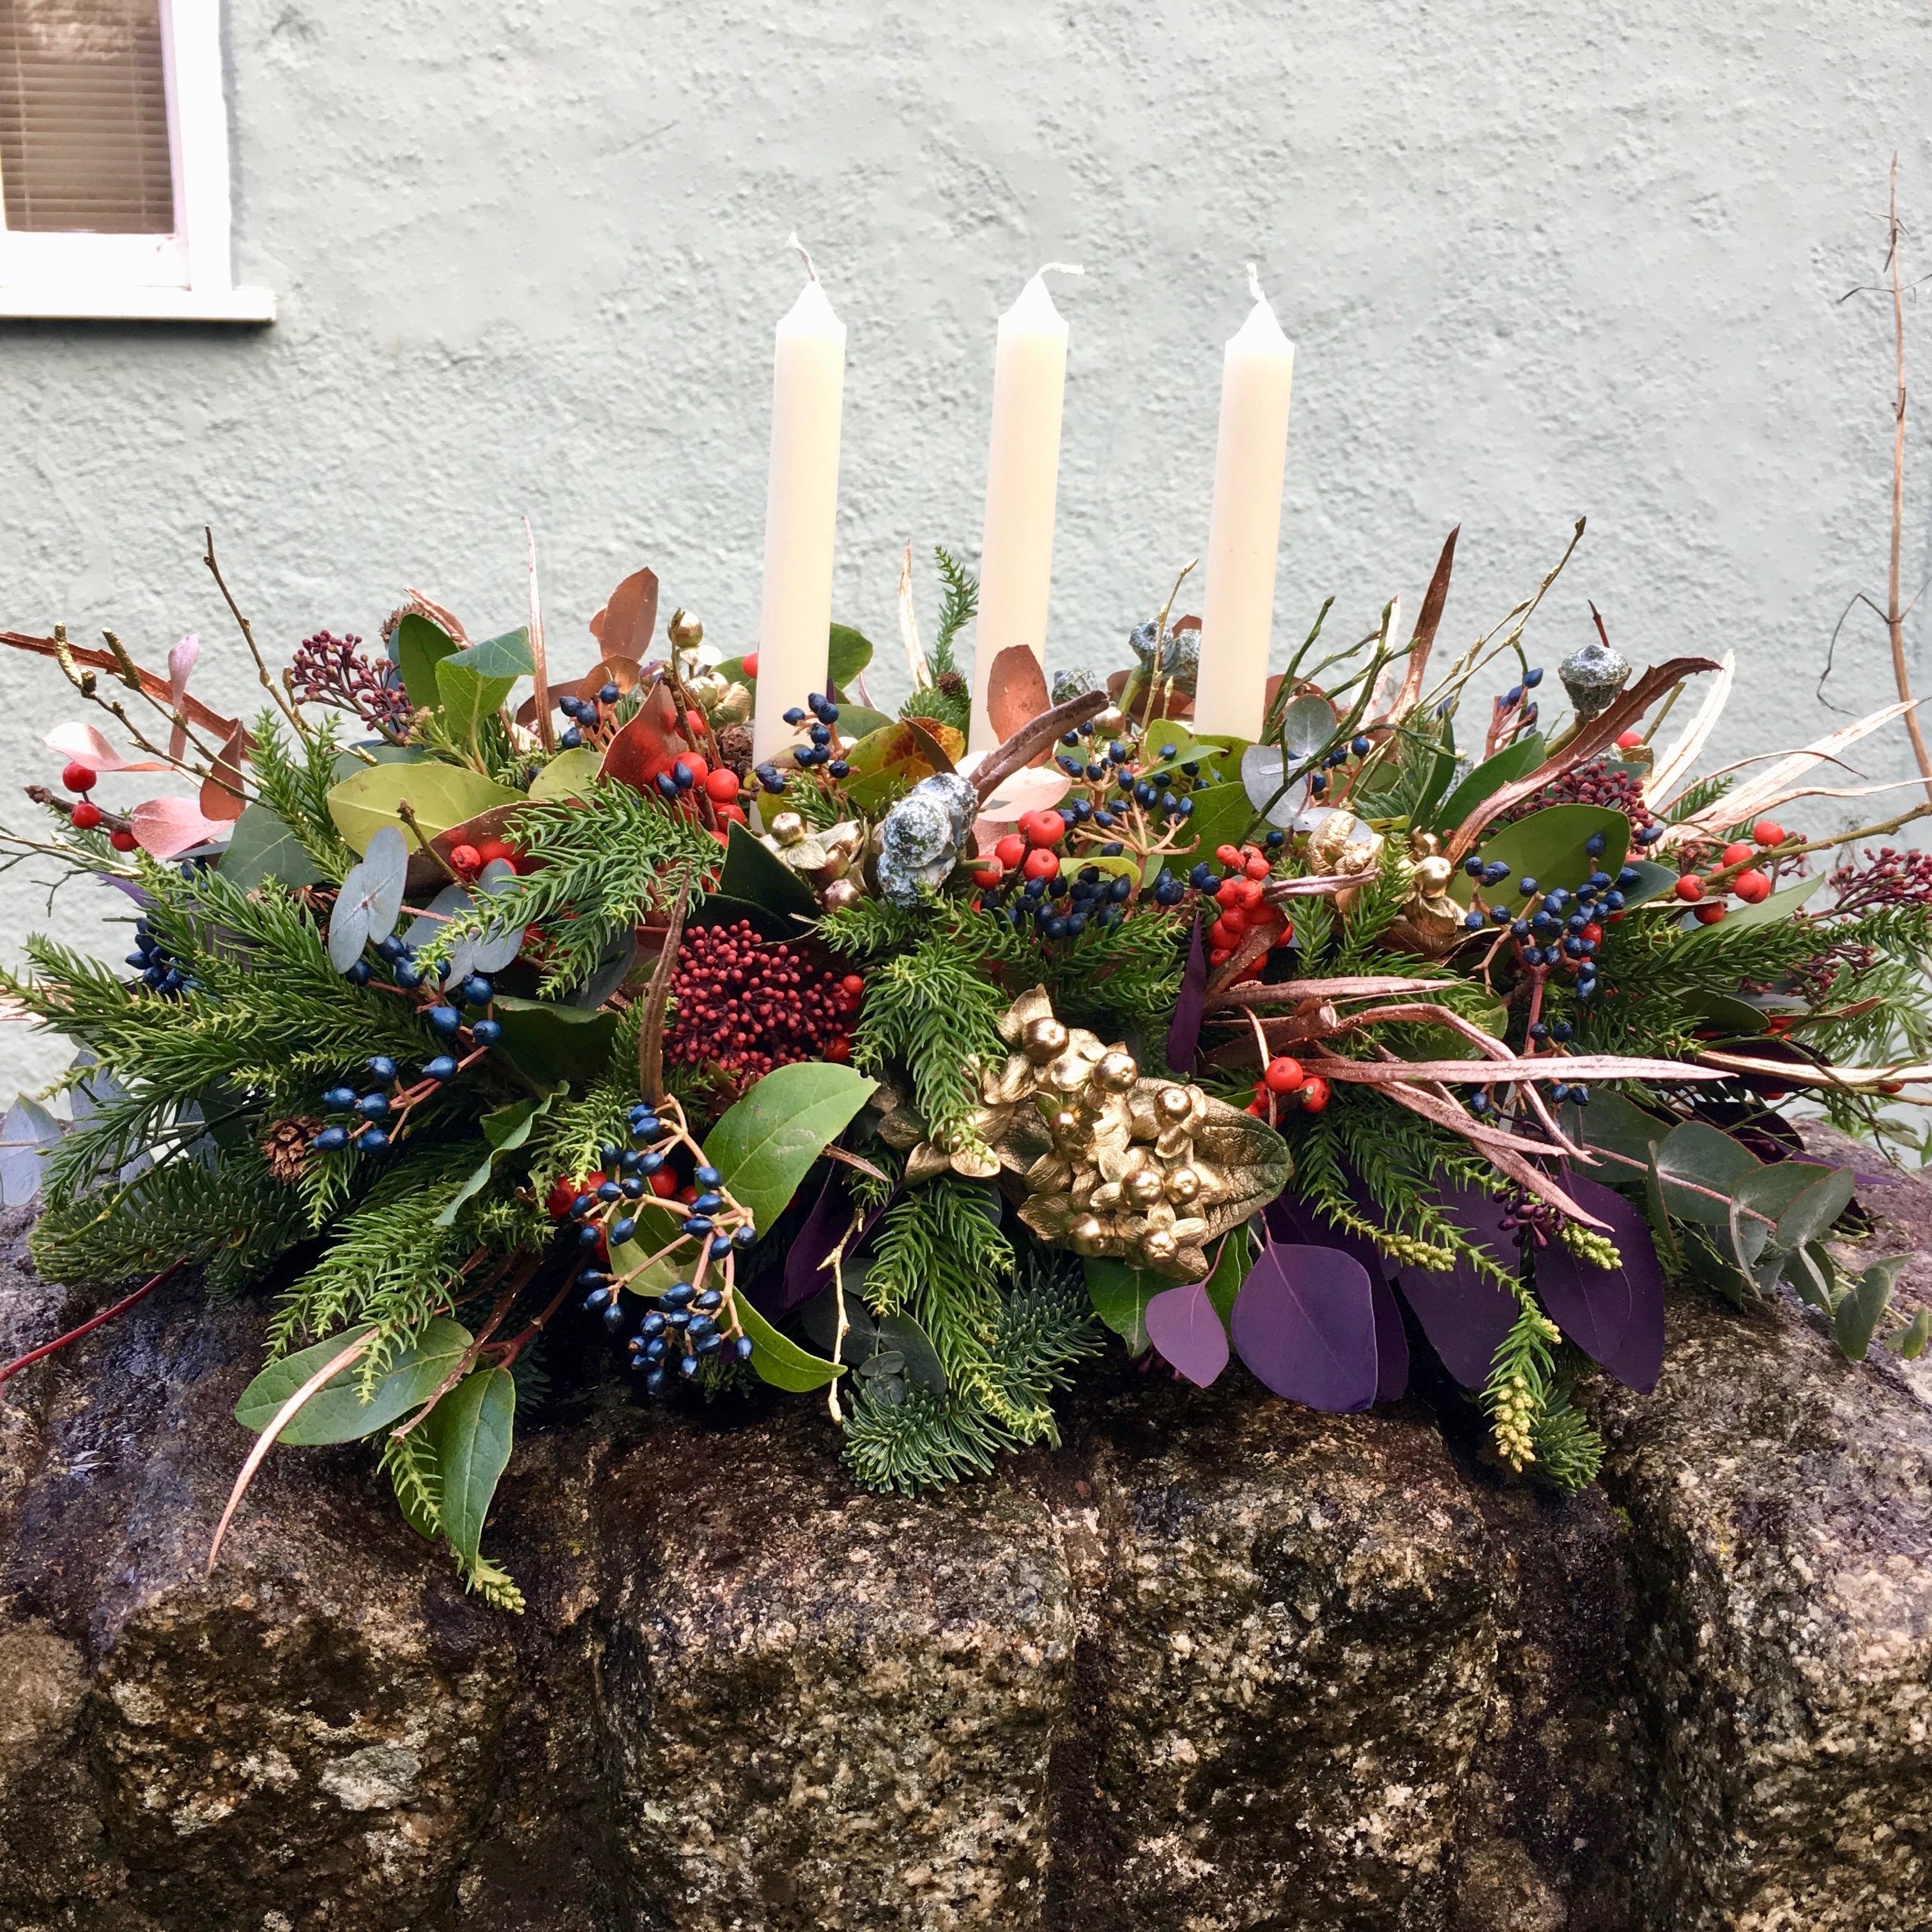 The Hempston Festive Arrangement